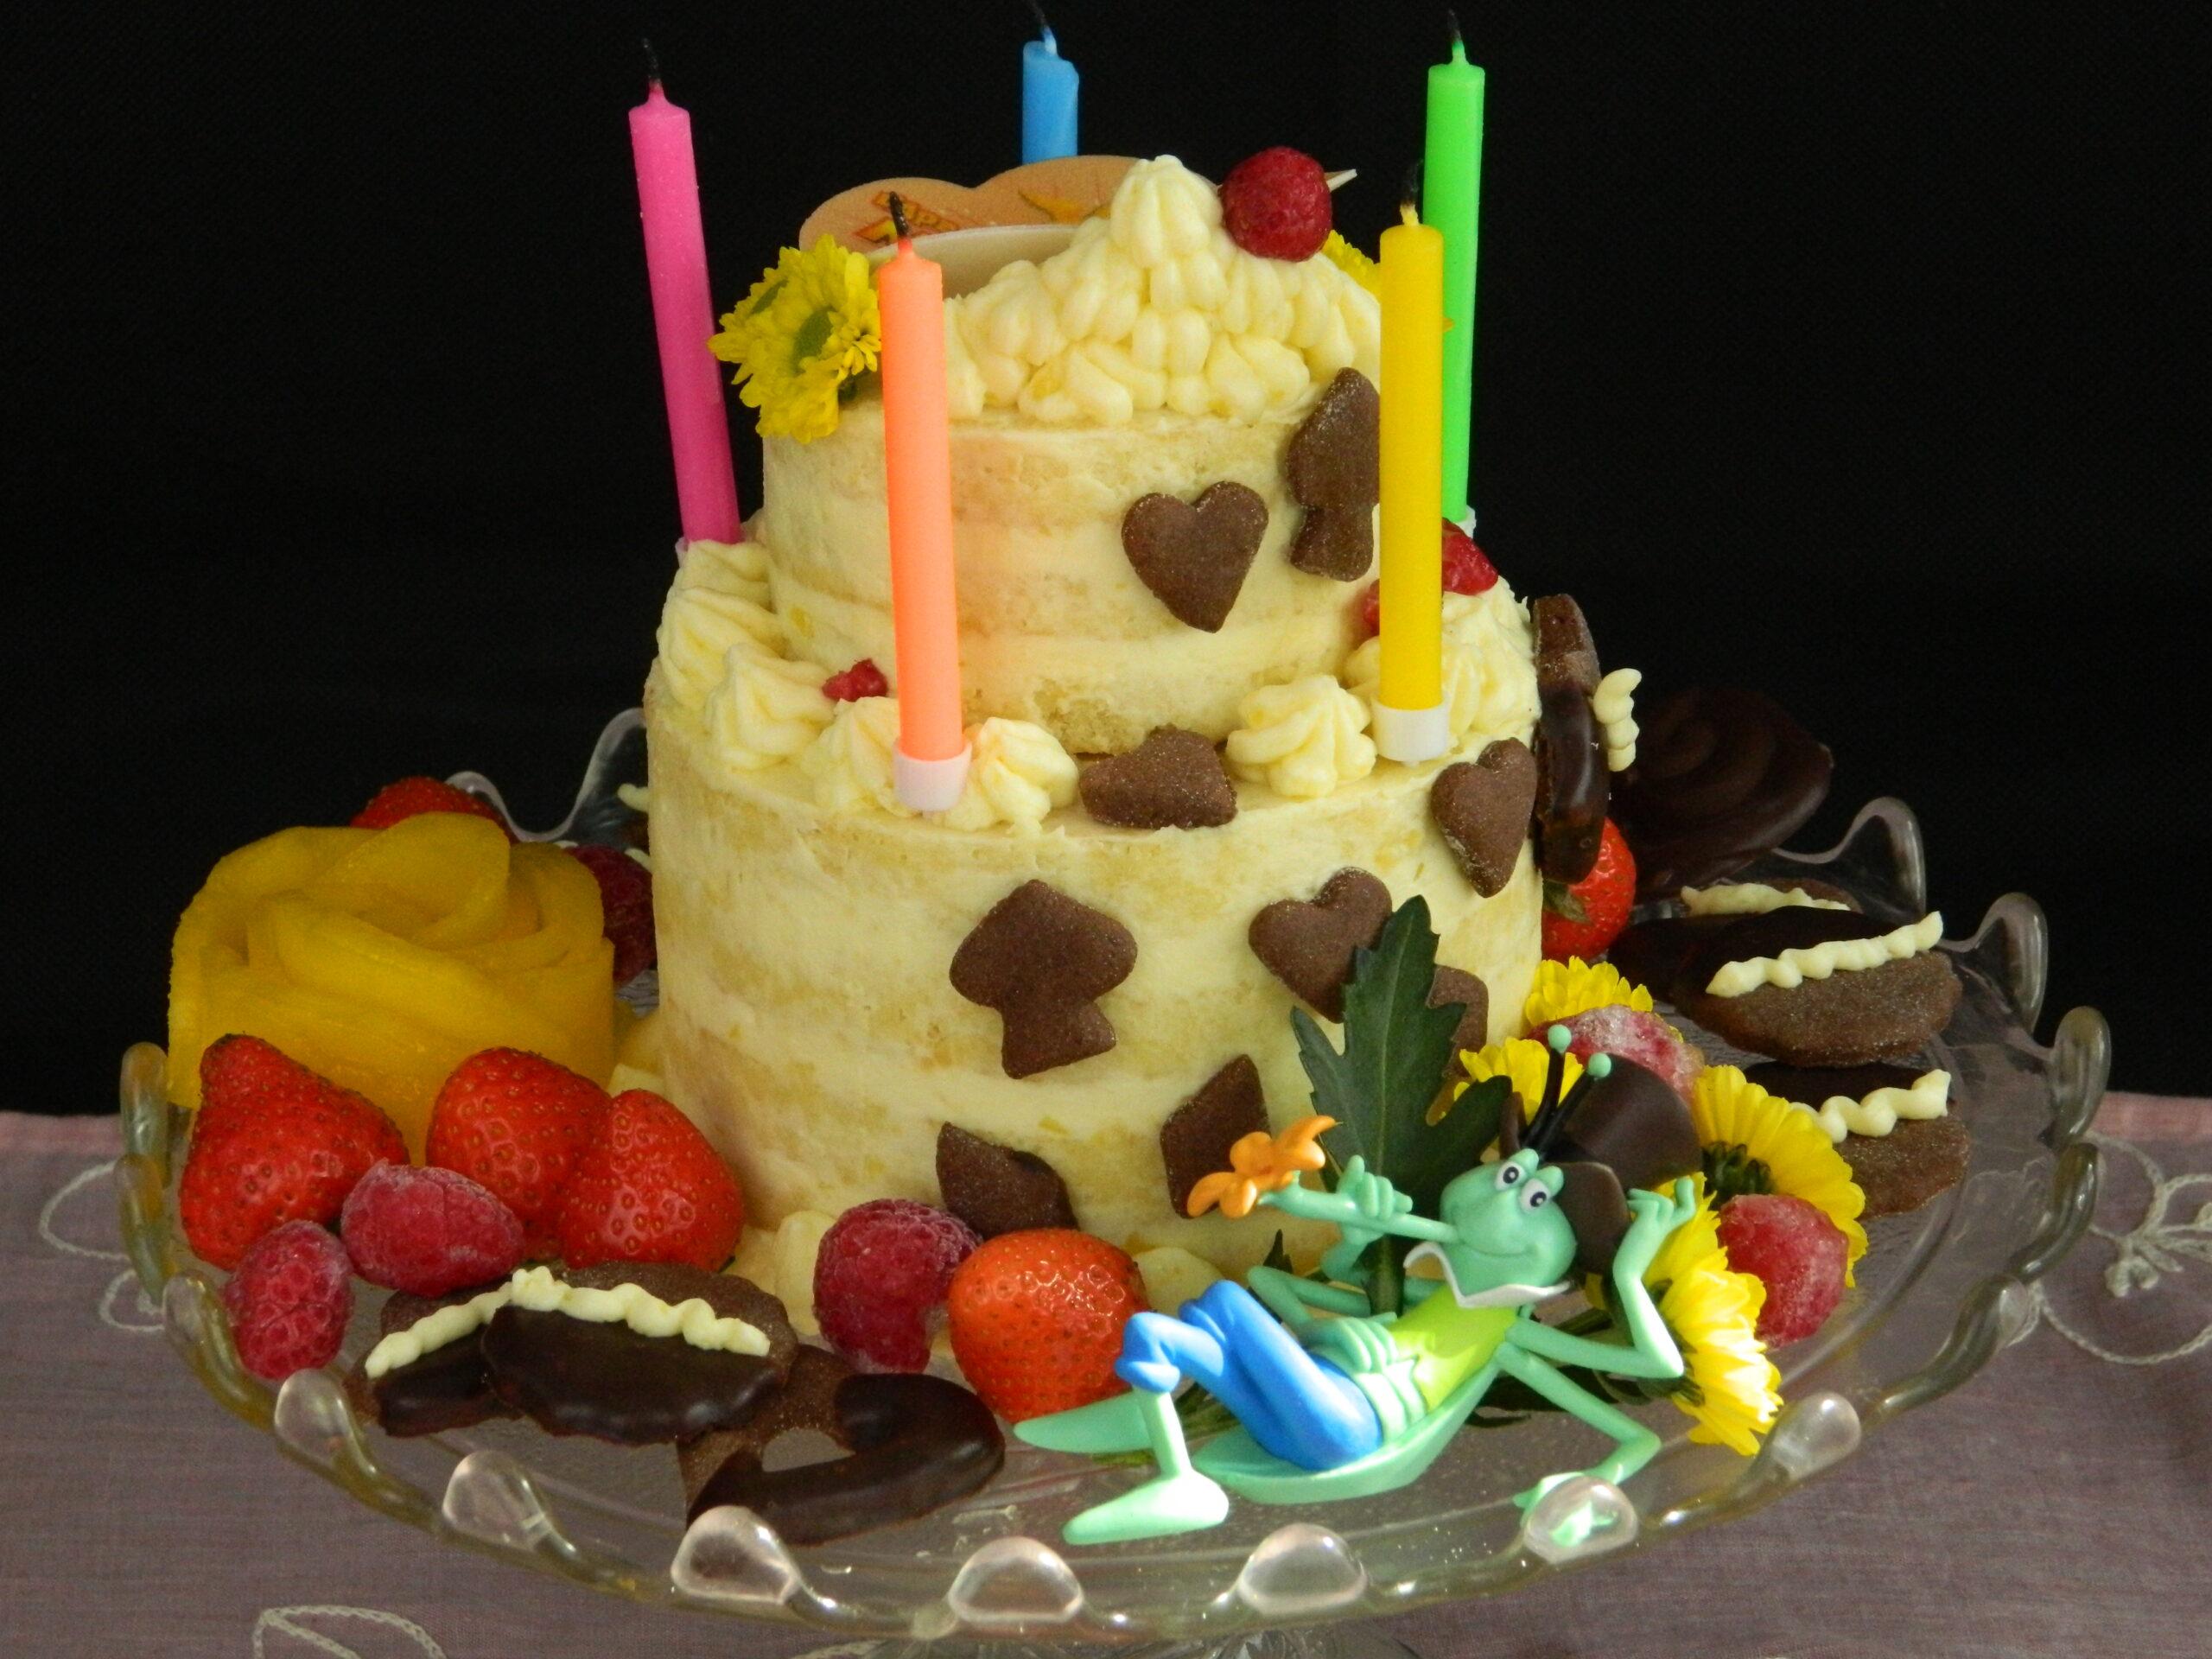 Scrumptious Vanilla Layered Cake